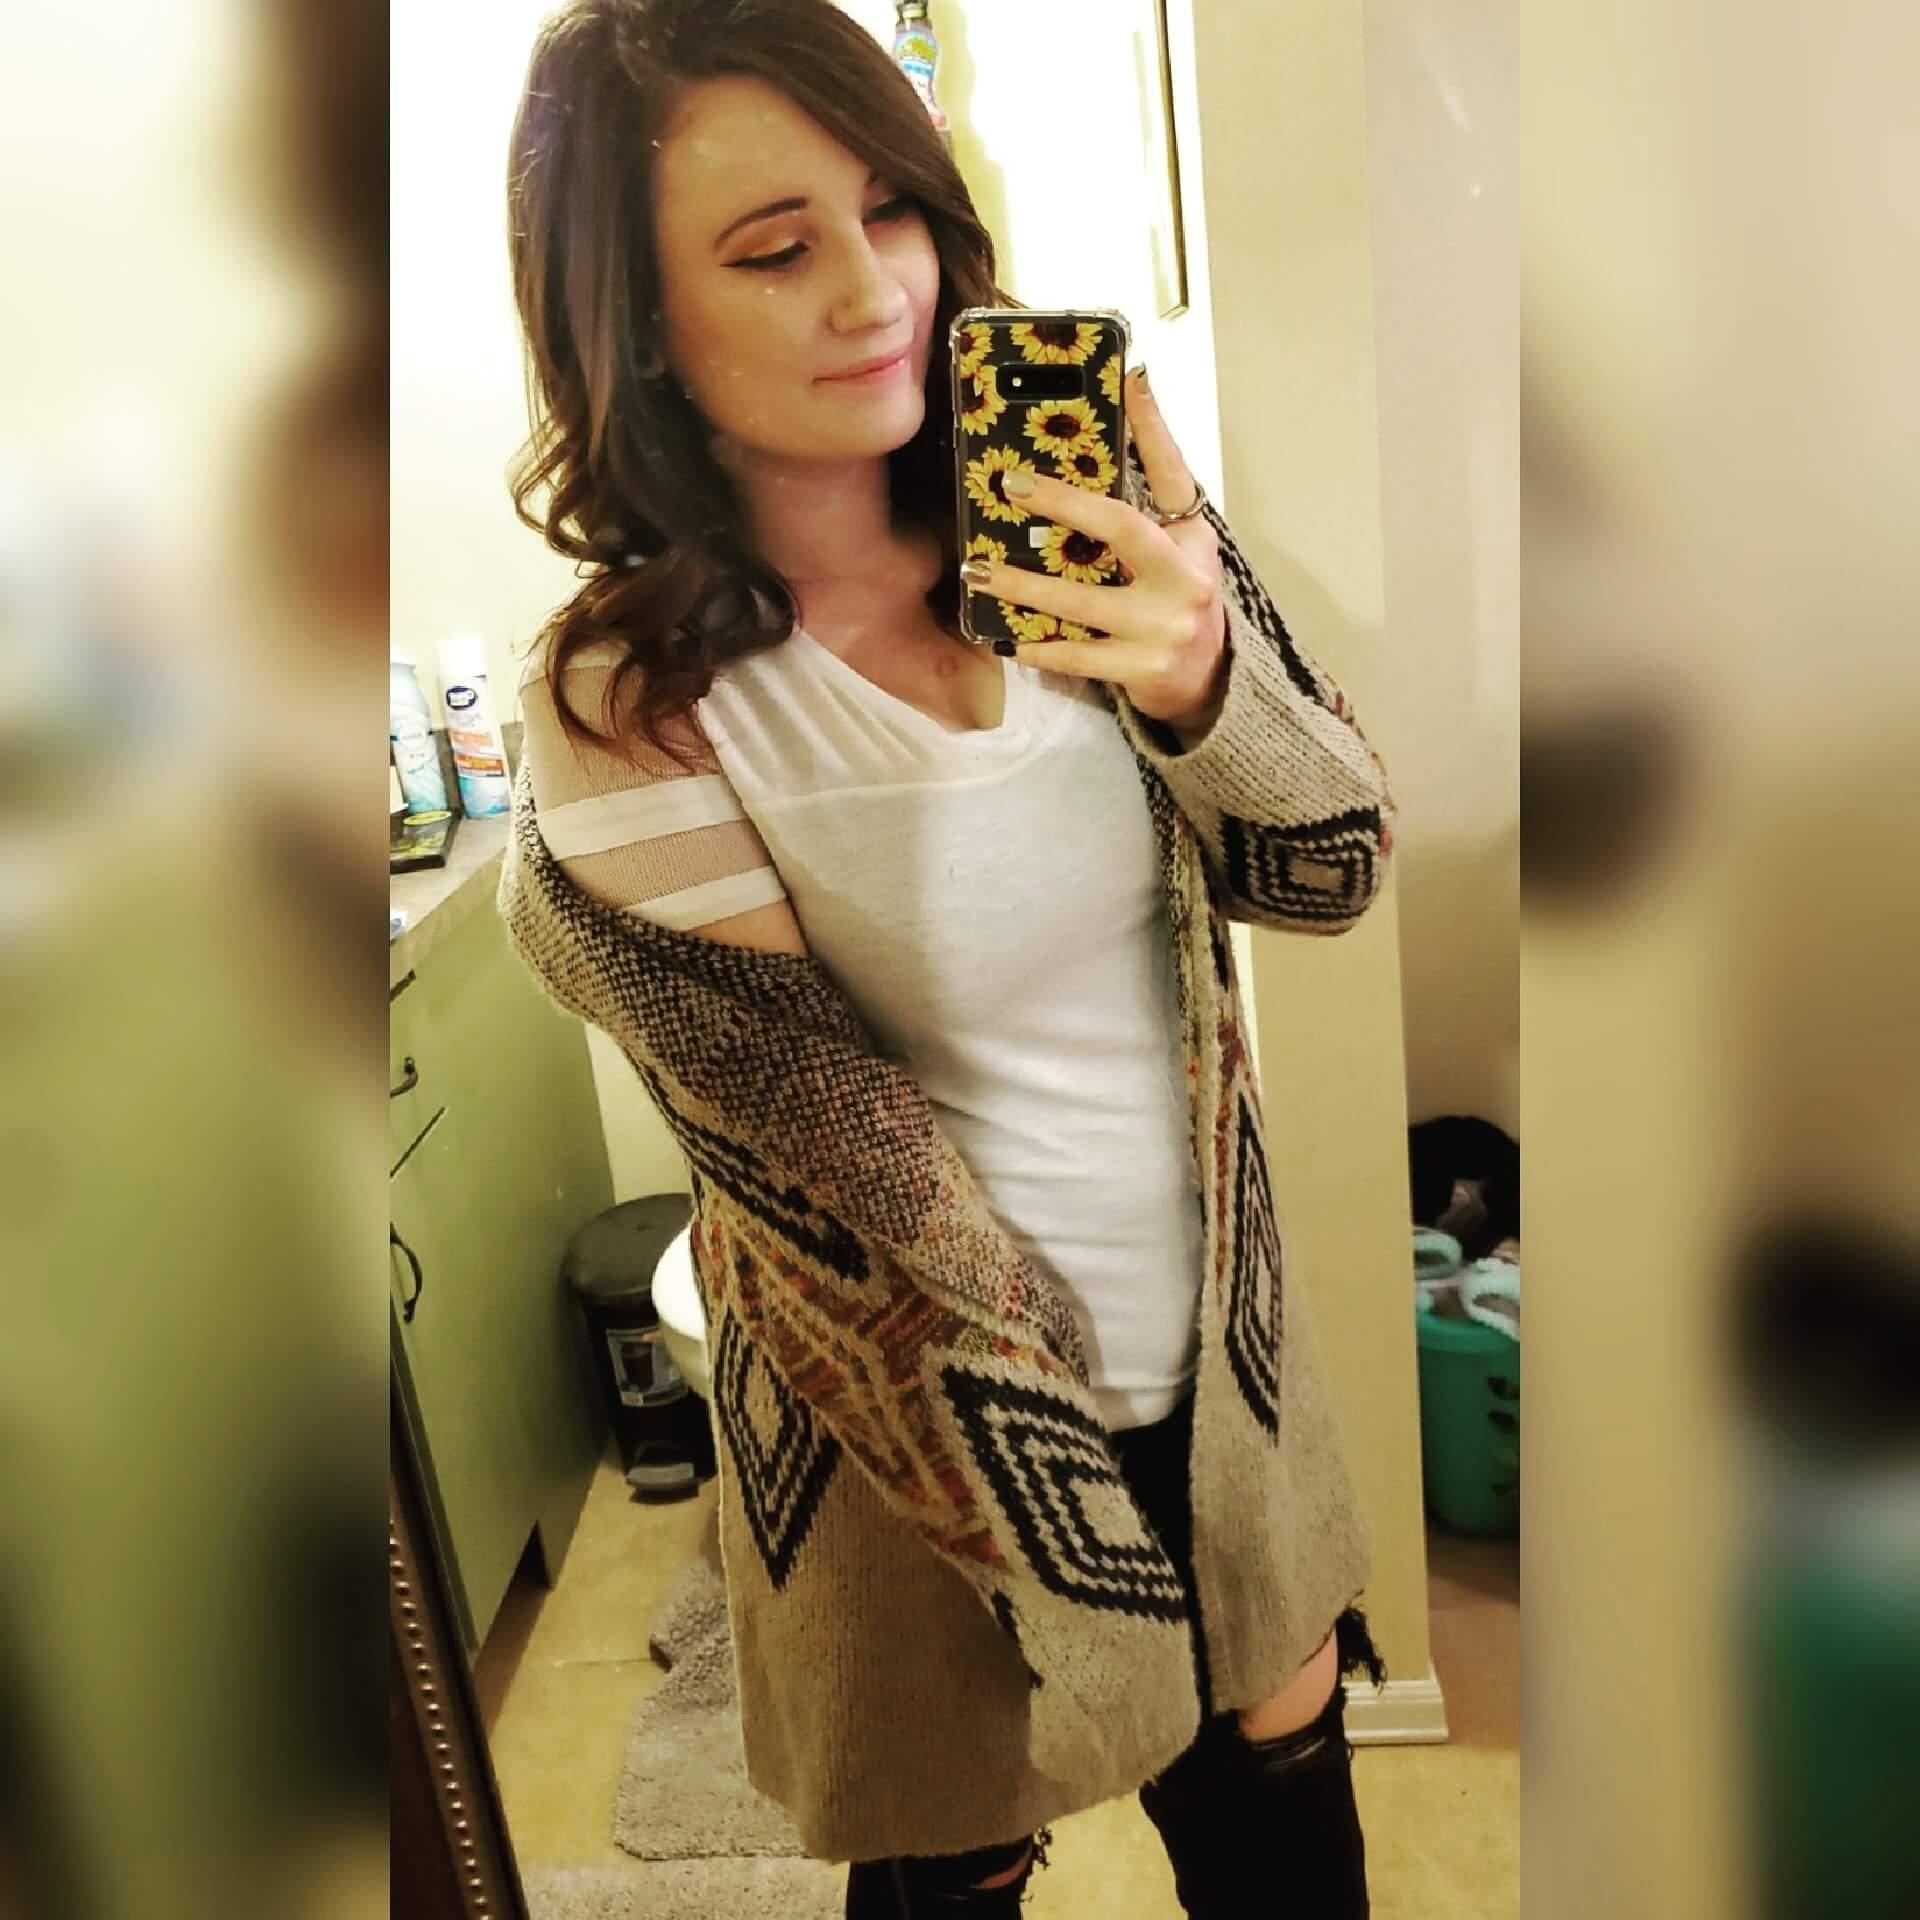 Lizzy Copeland